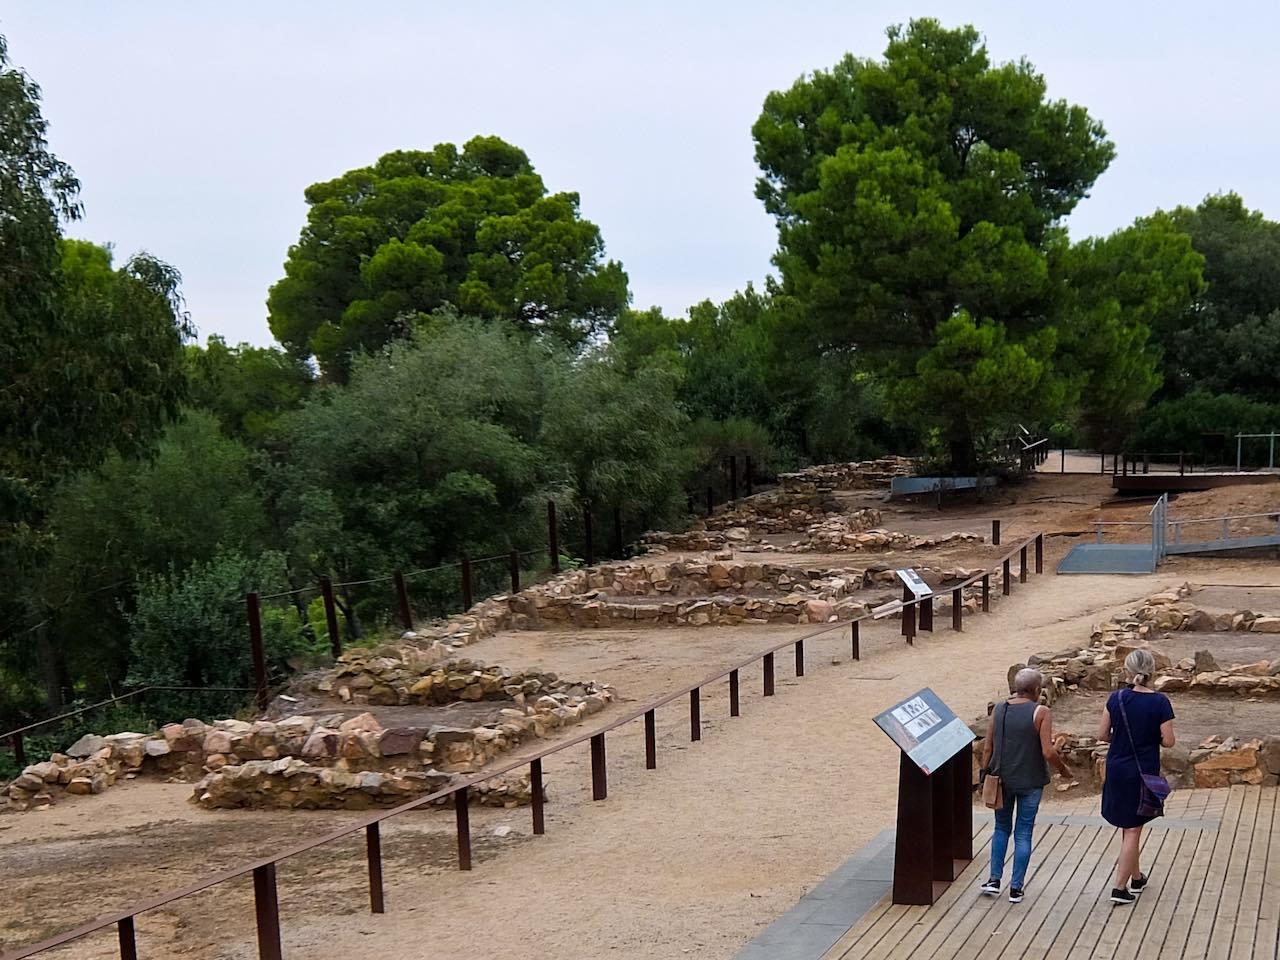 Sant Sebastià de la Guarda Historical Site